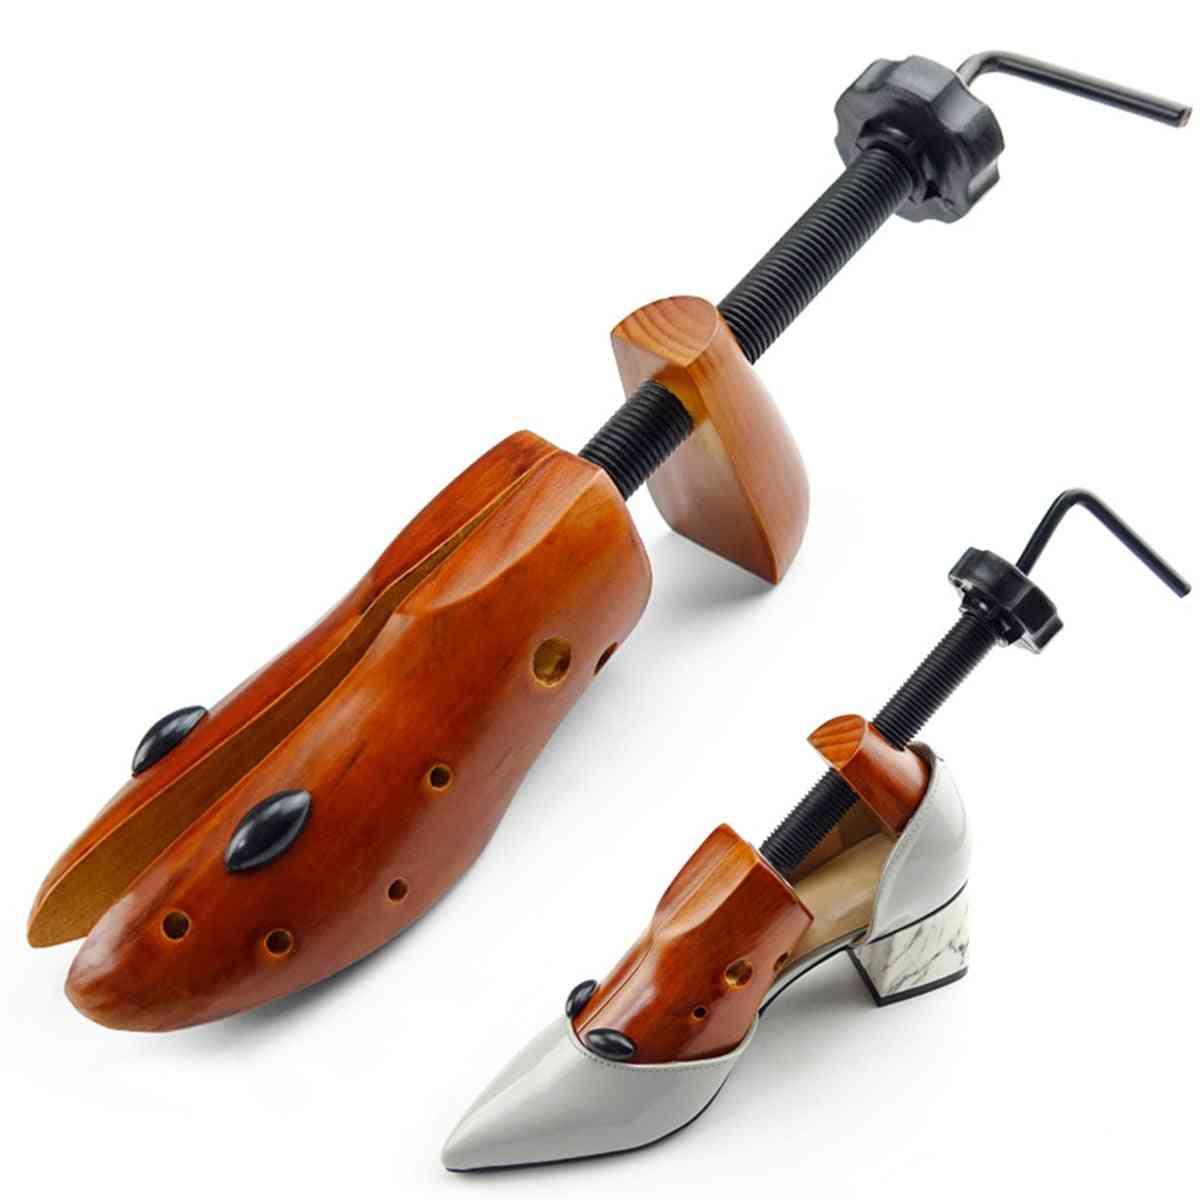 Wooden Shoe Tree Men Women Expander Adjustable Stretcher Shaper Rack